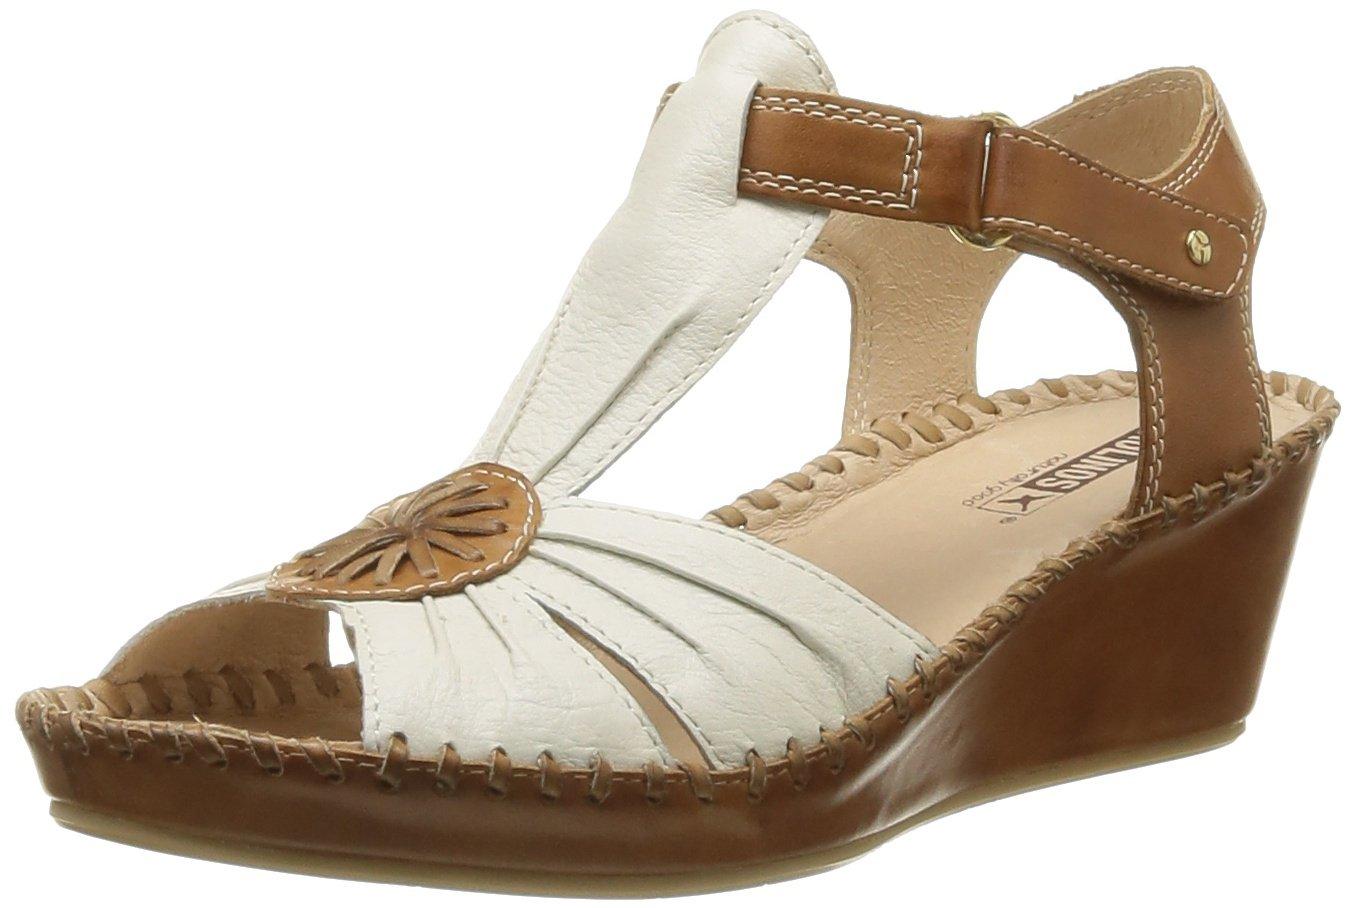 Pikolinos Women's Margarita Wedge Sandal B00F5A70OO 41 B EU / 10.5-11 B US Women Nata